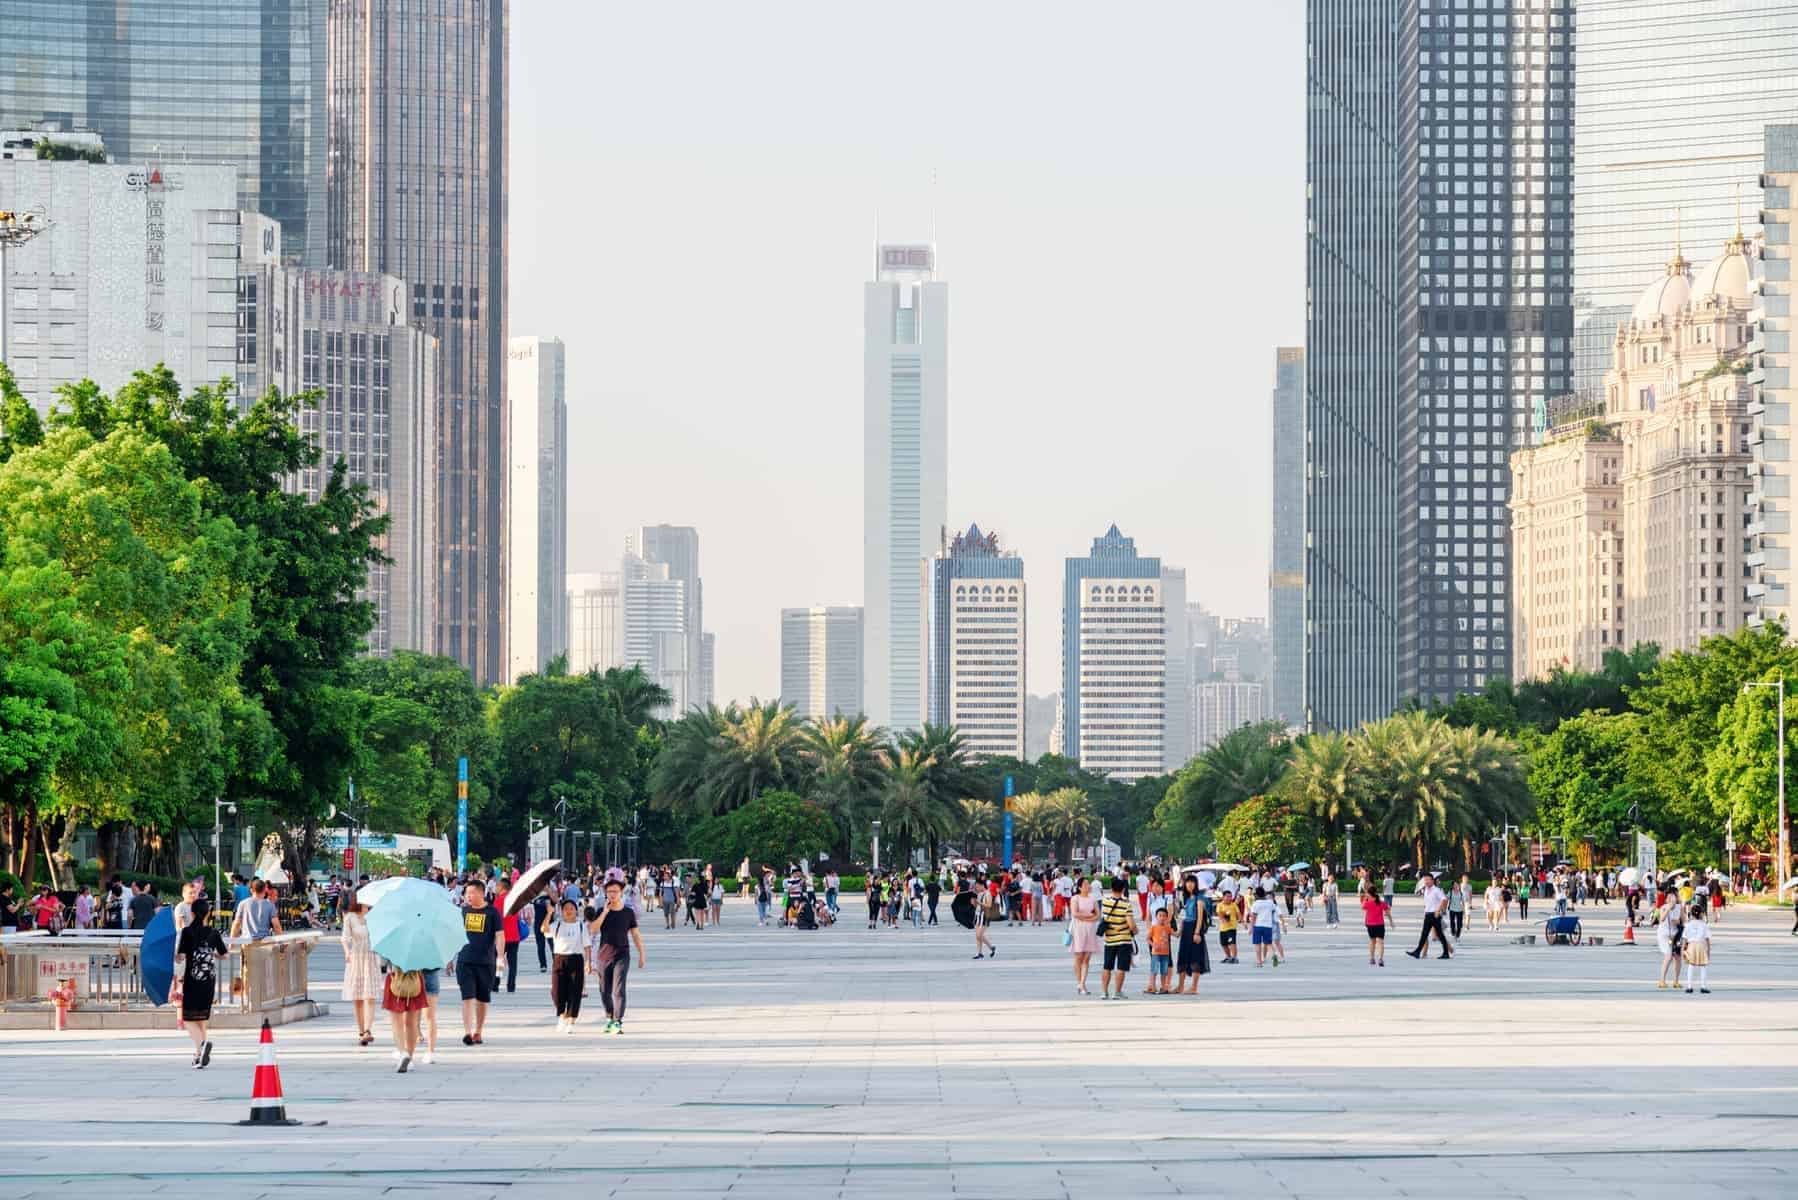 Guangzhou, China : Asian tourists walking in a scenic city park among modern buildings in the Tianhe District of the Zhujiang New Town. Guangzhou is a popular tourist destination